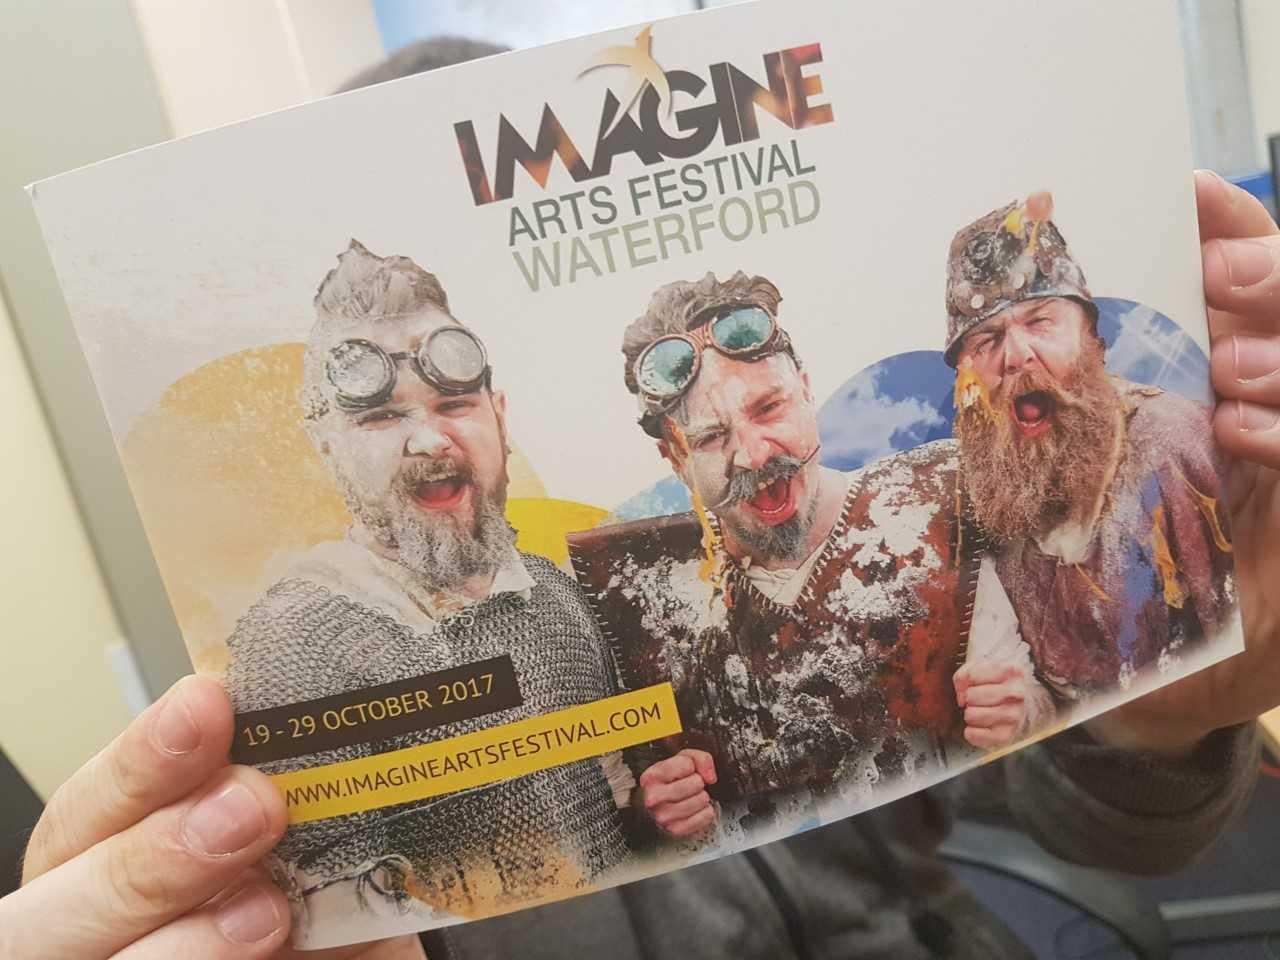 Listen: This year's Imagine Arts Festival has a bumper line up!